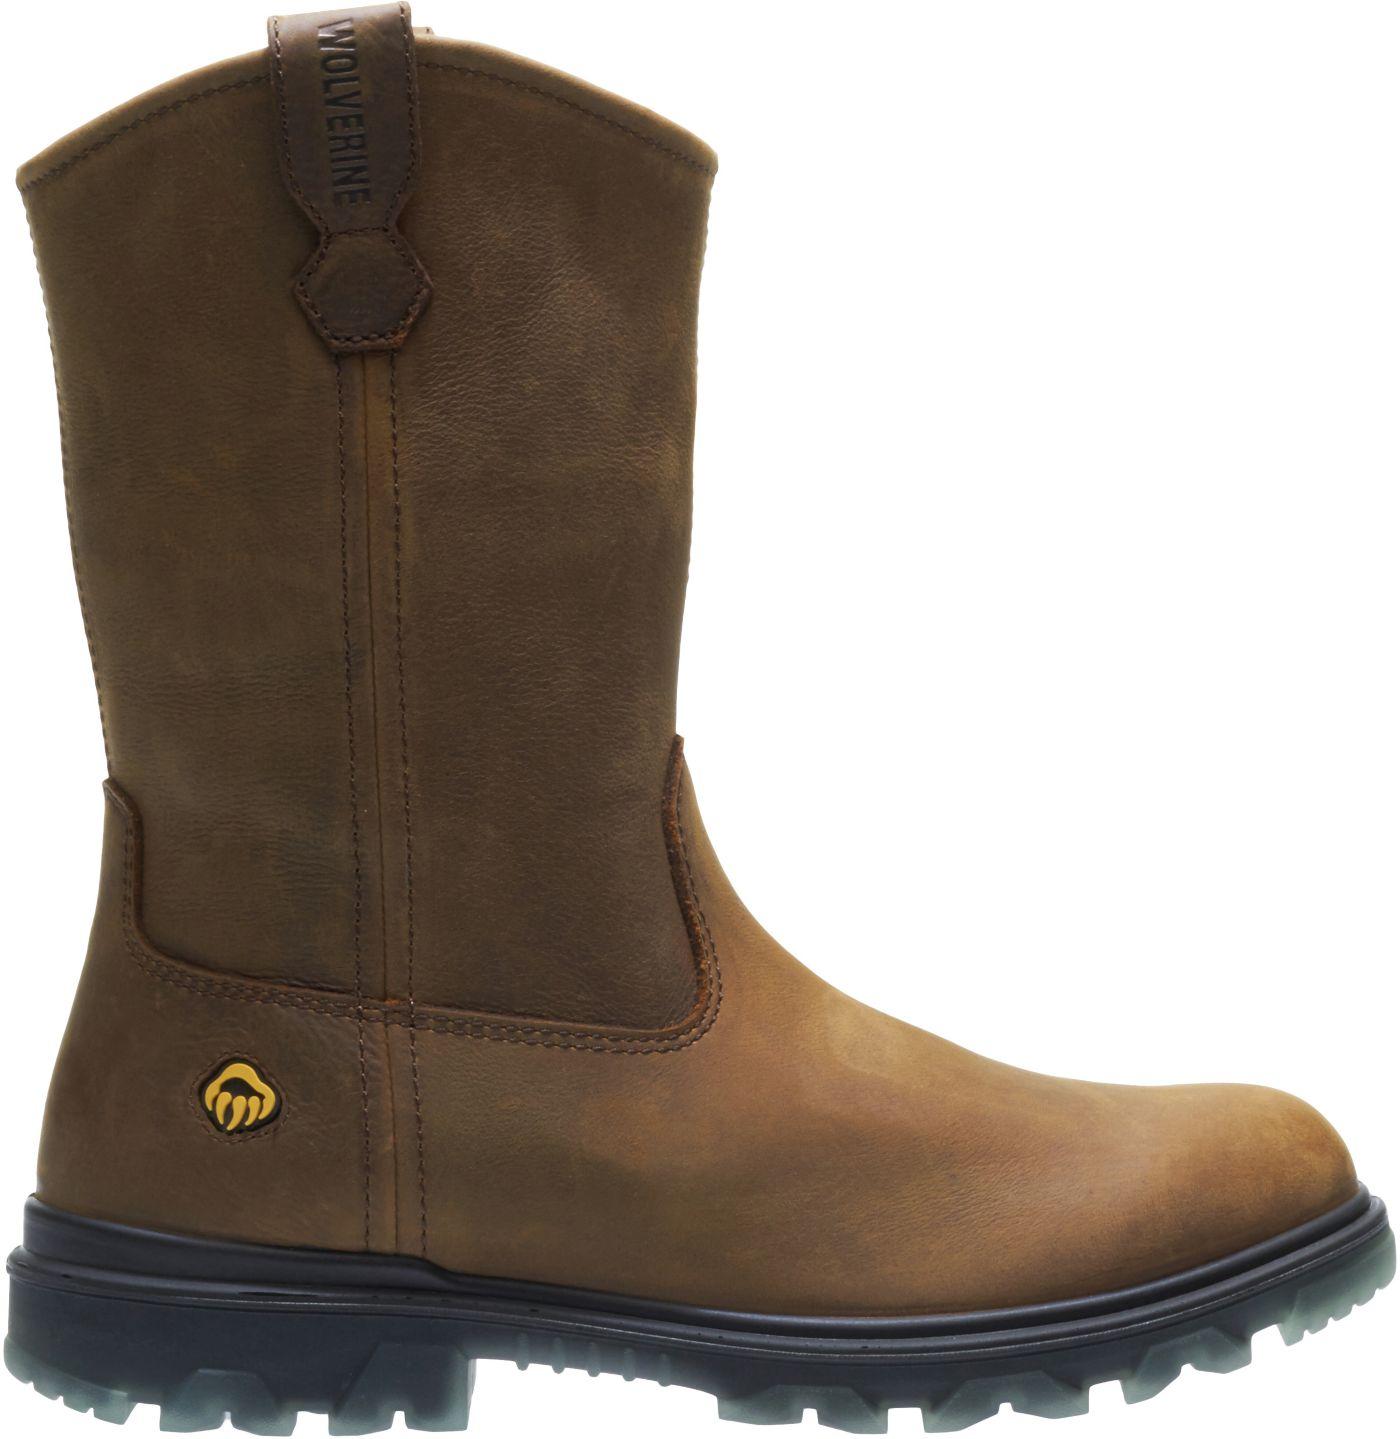 Wolverine Men's I-90 EPX Waterproof Wellington Work Boots